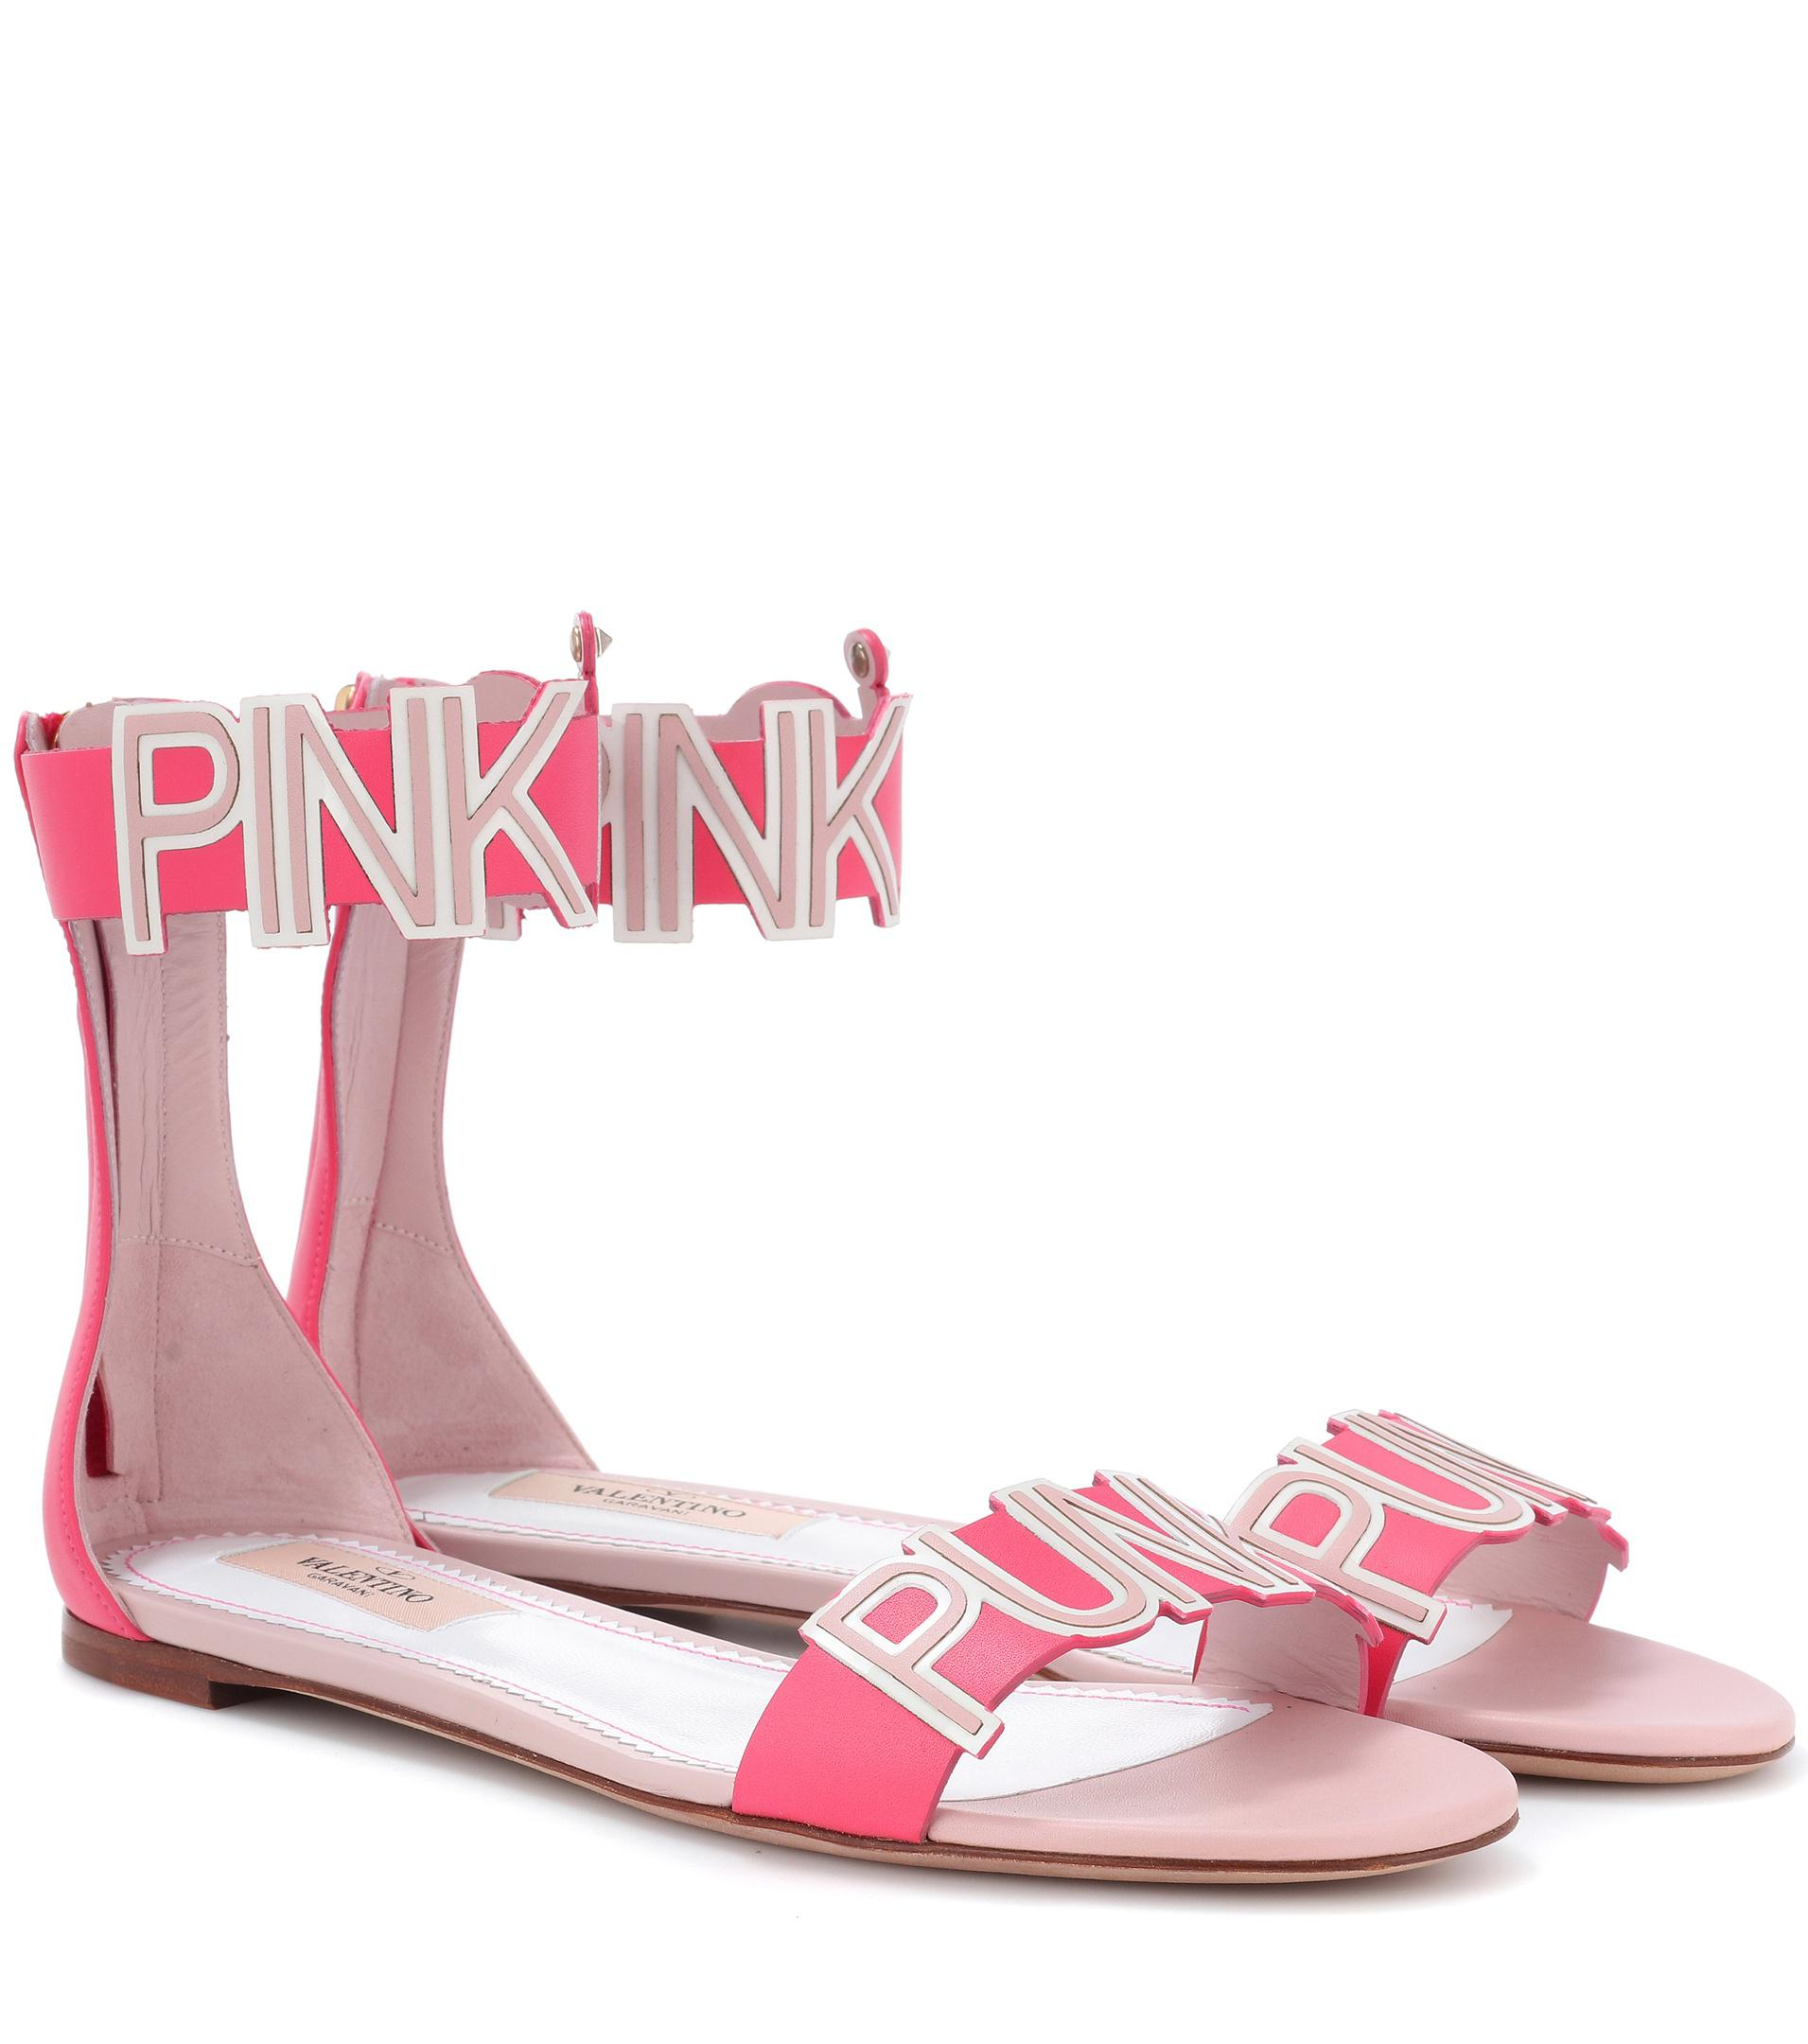 Valentino Garavani Pink Punk sandals - Pink & Purple Valentino 5F3yH